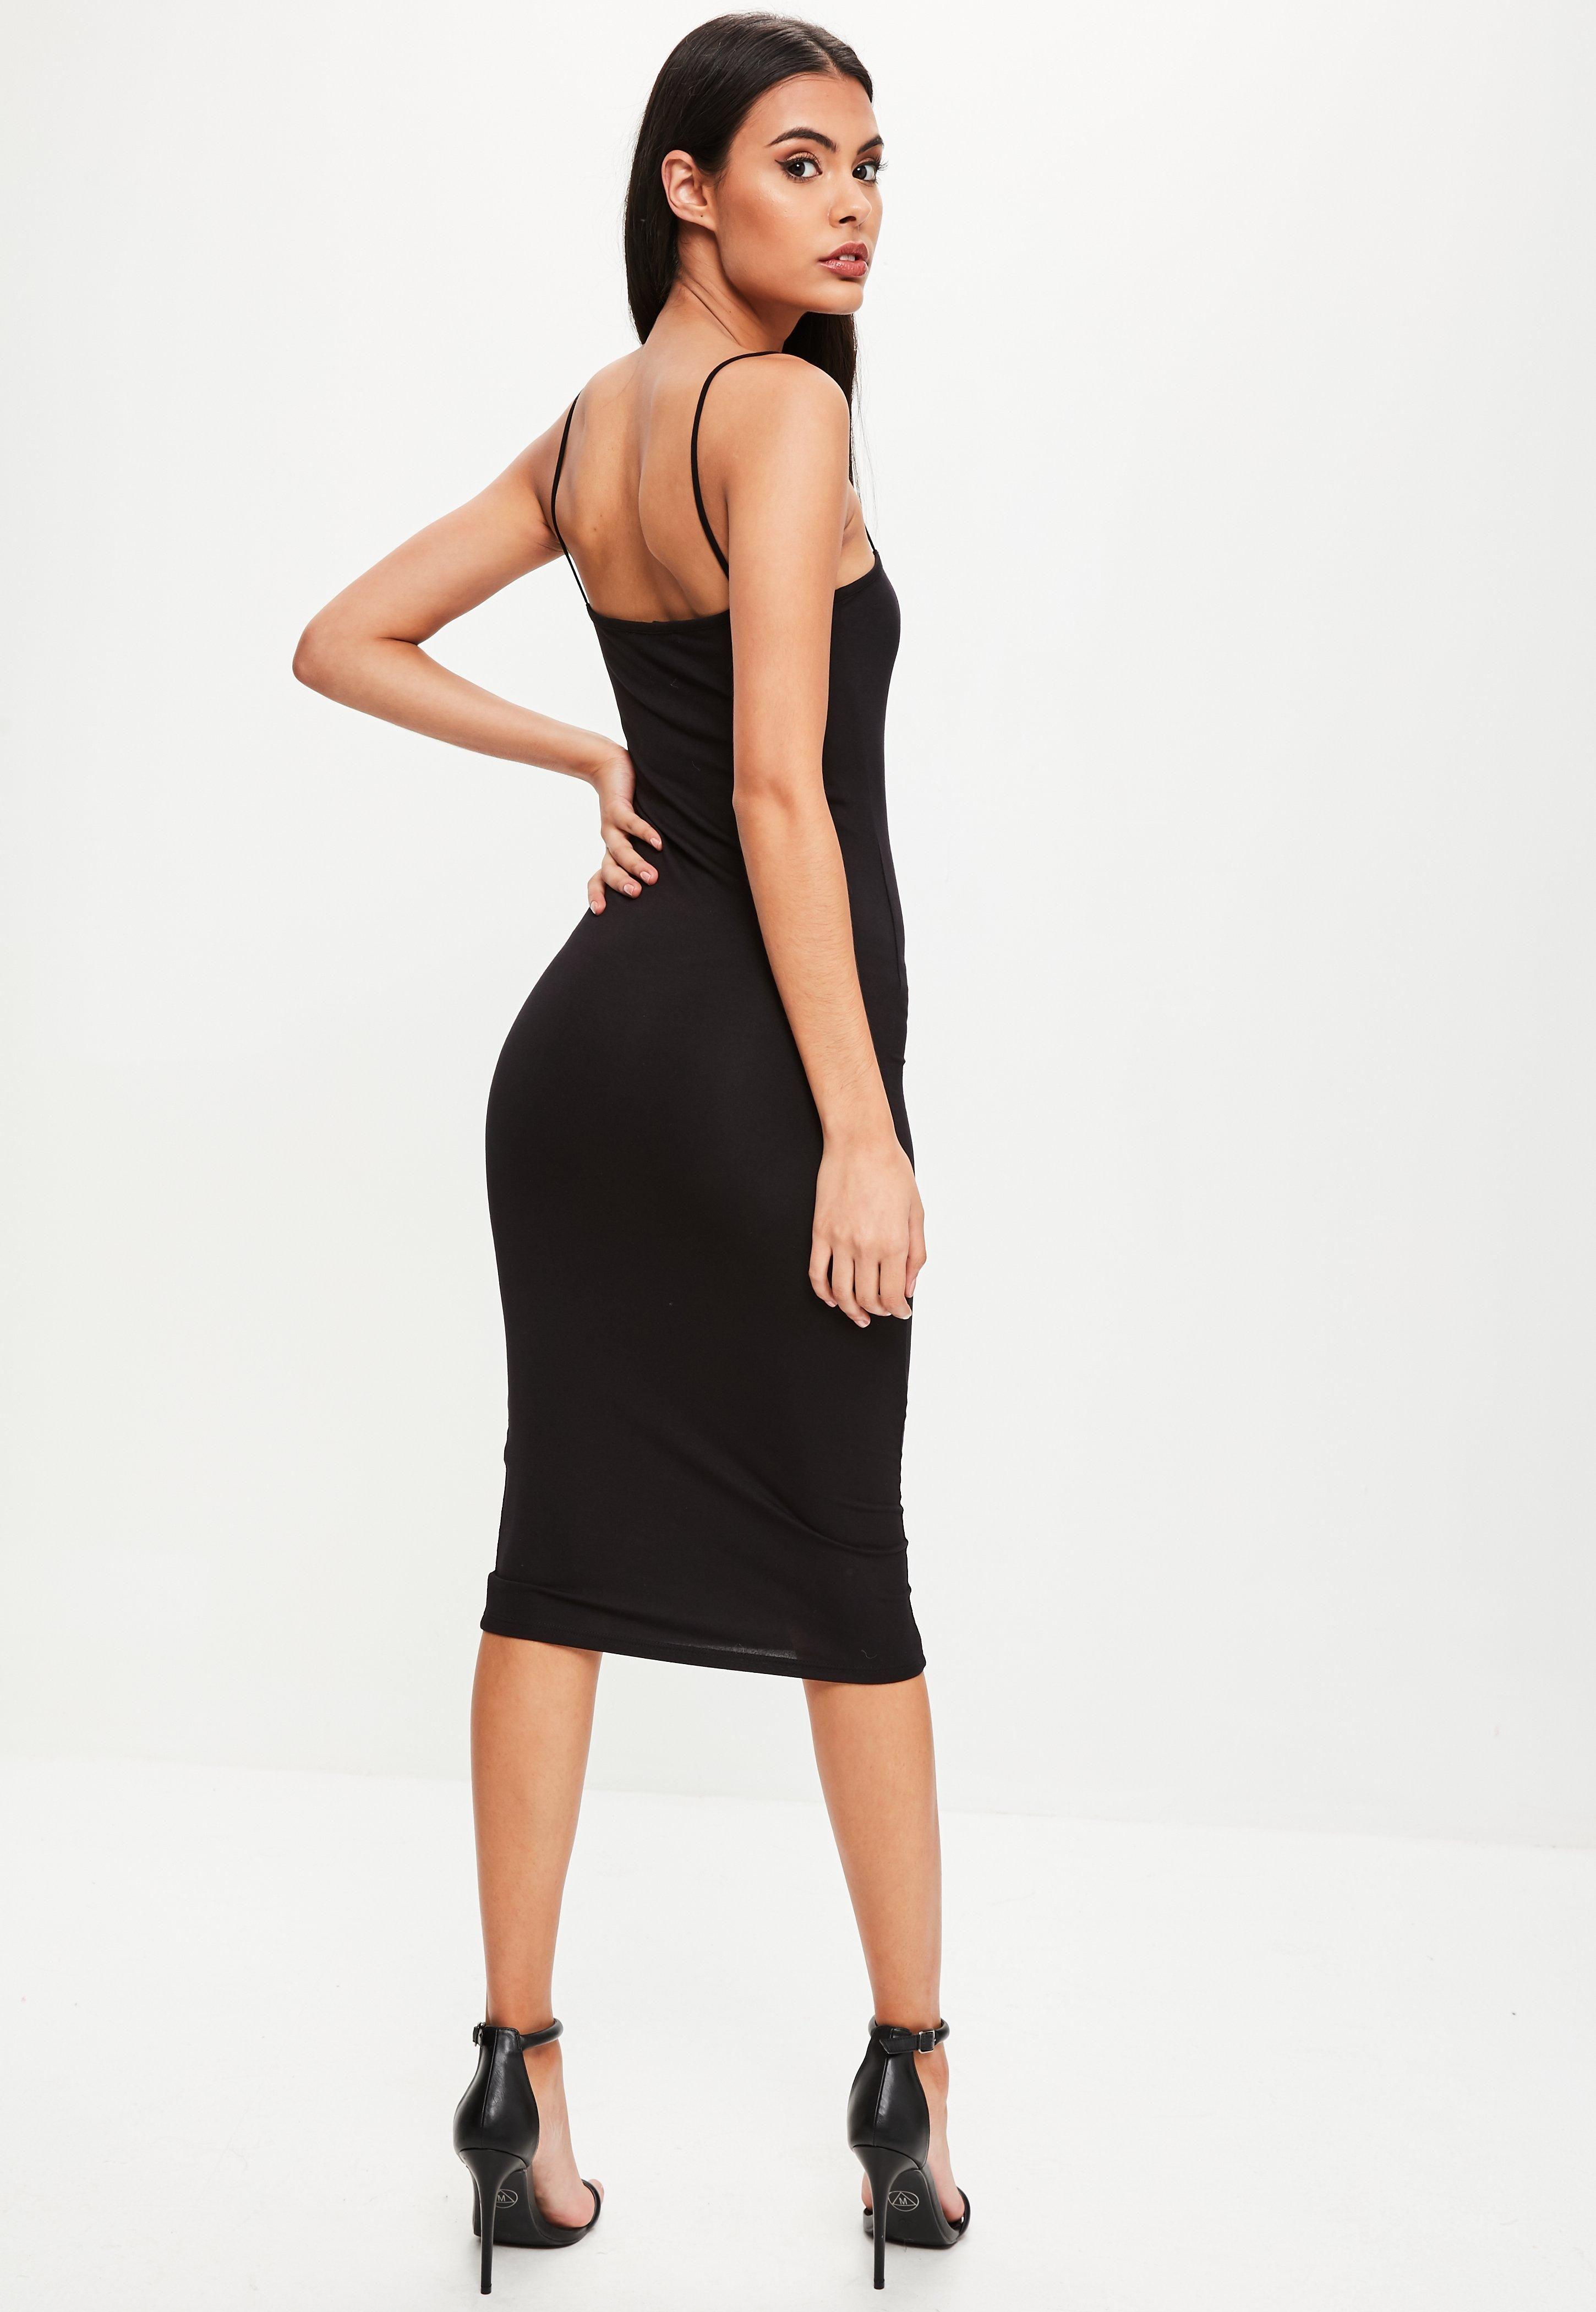 Asos Design Asos Design Cowl Neck Cami Midi Prom Dress Black Asosdesign Cloth Midi Prom Dress Black Prom Dresses Prom Dress Trends [ 1110 x 870 Pixel ]